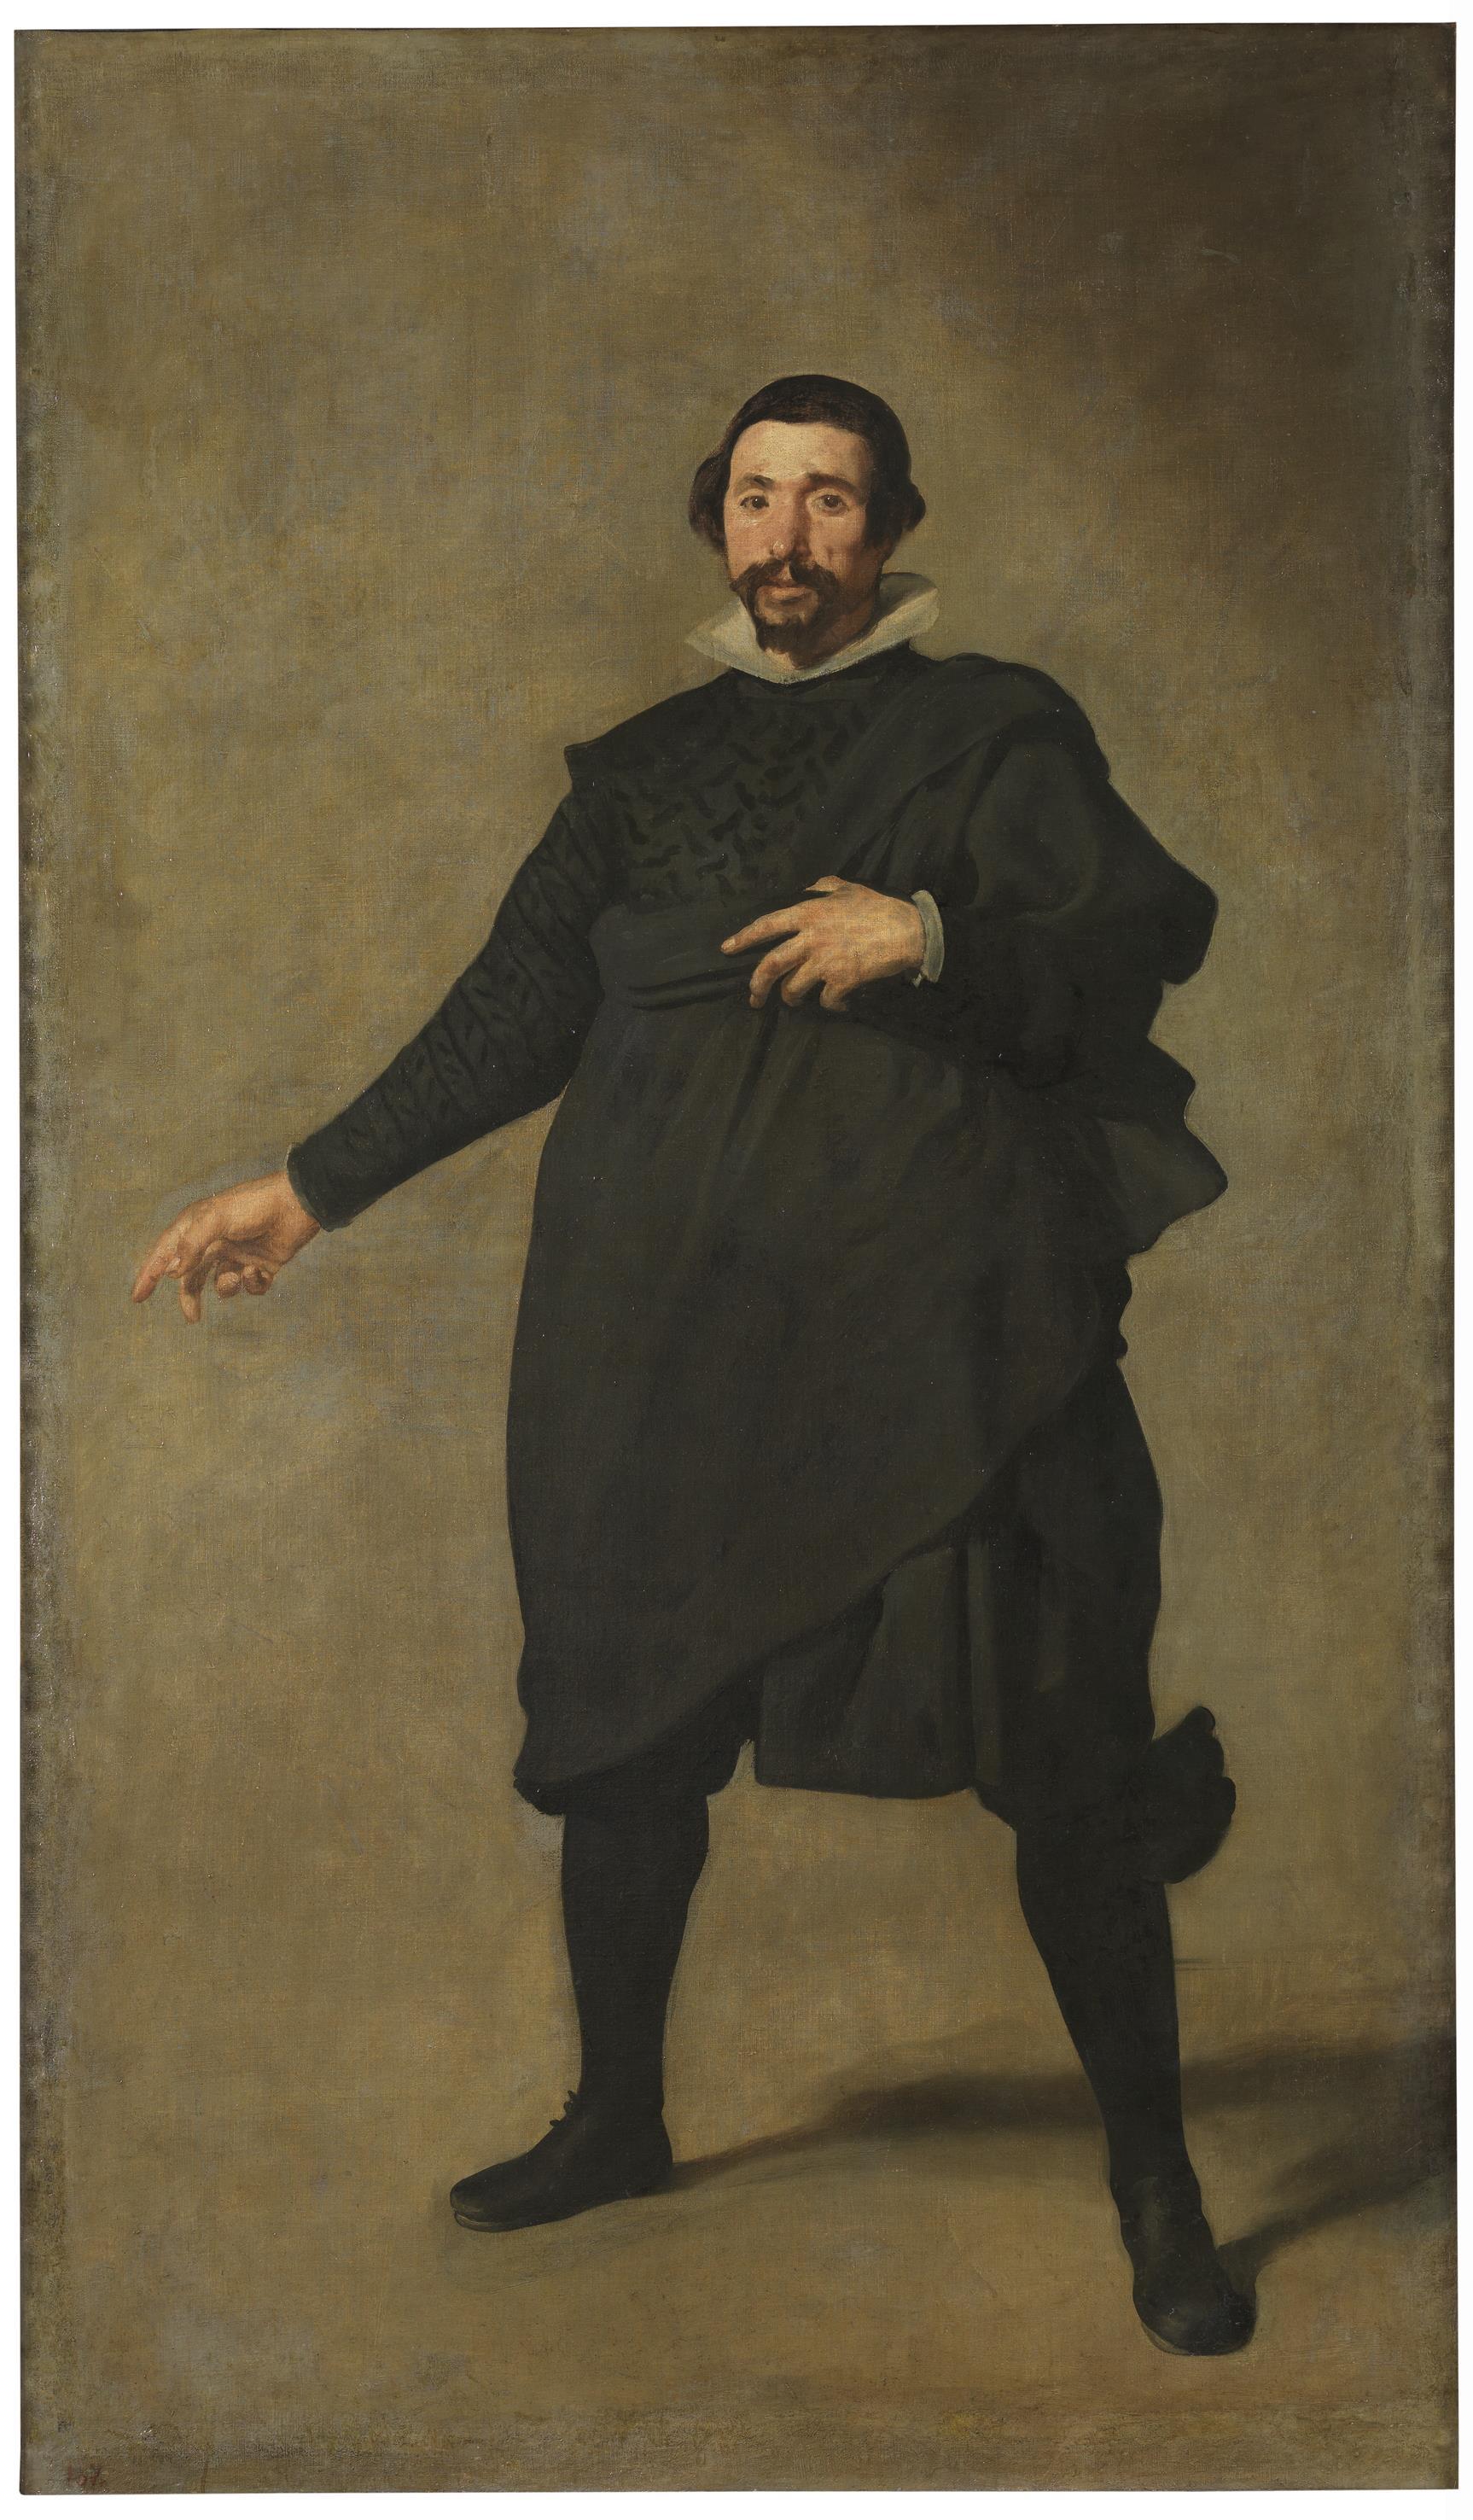 Pablo de Valladolid, de Velázquez